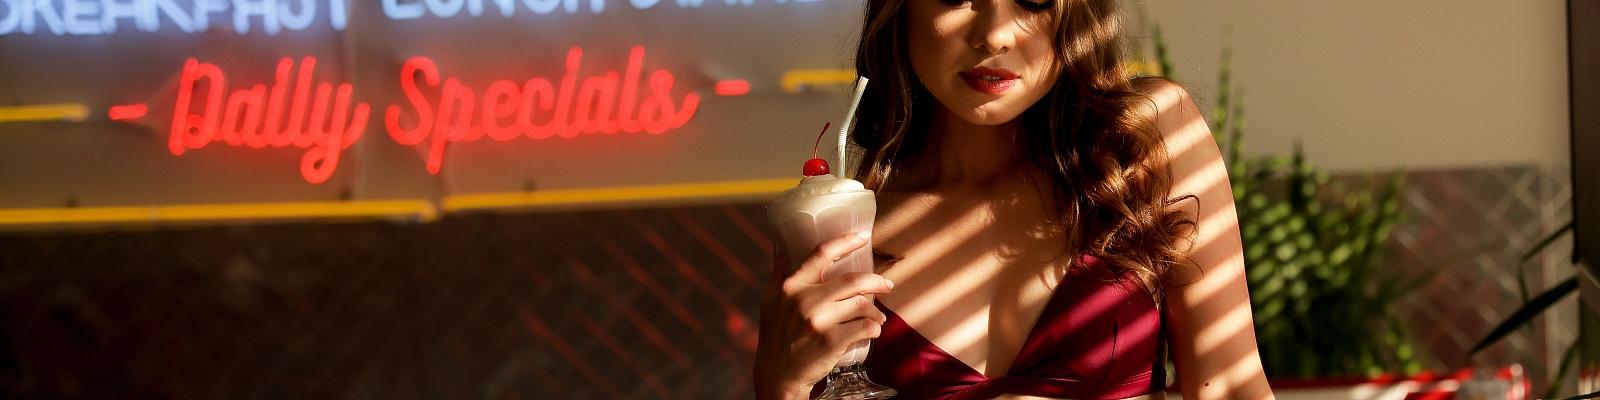 Angelina Dalio's Cover Photo